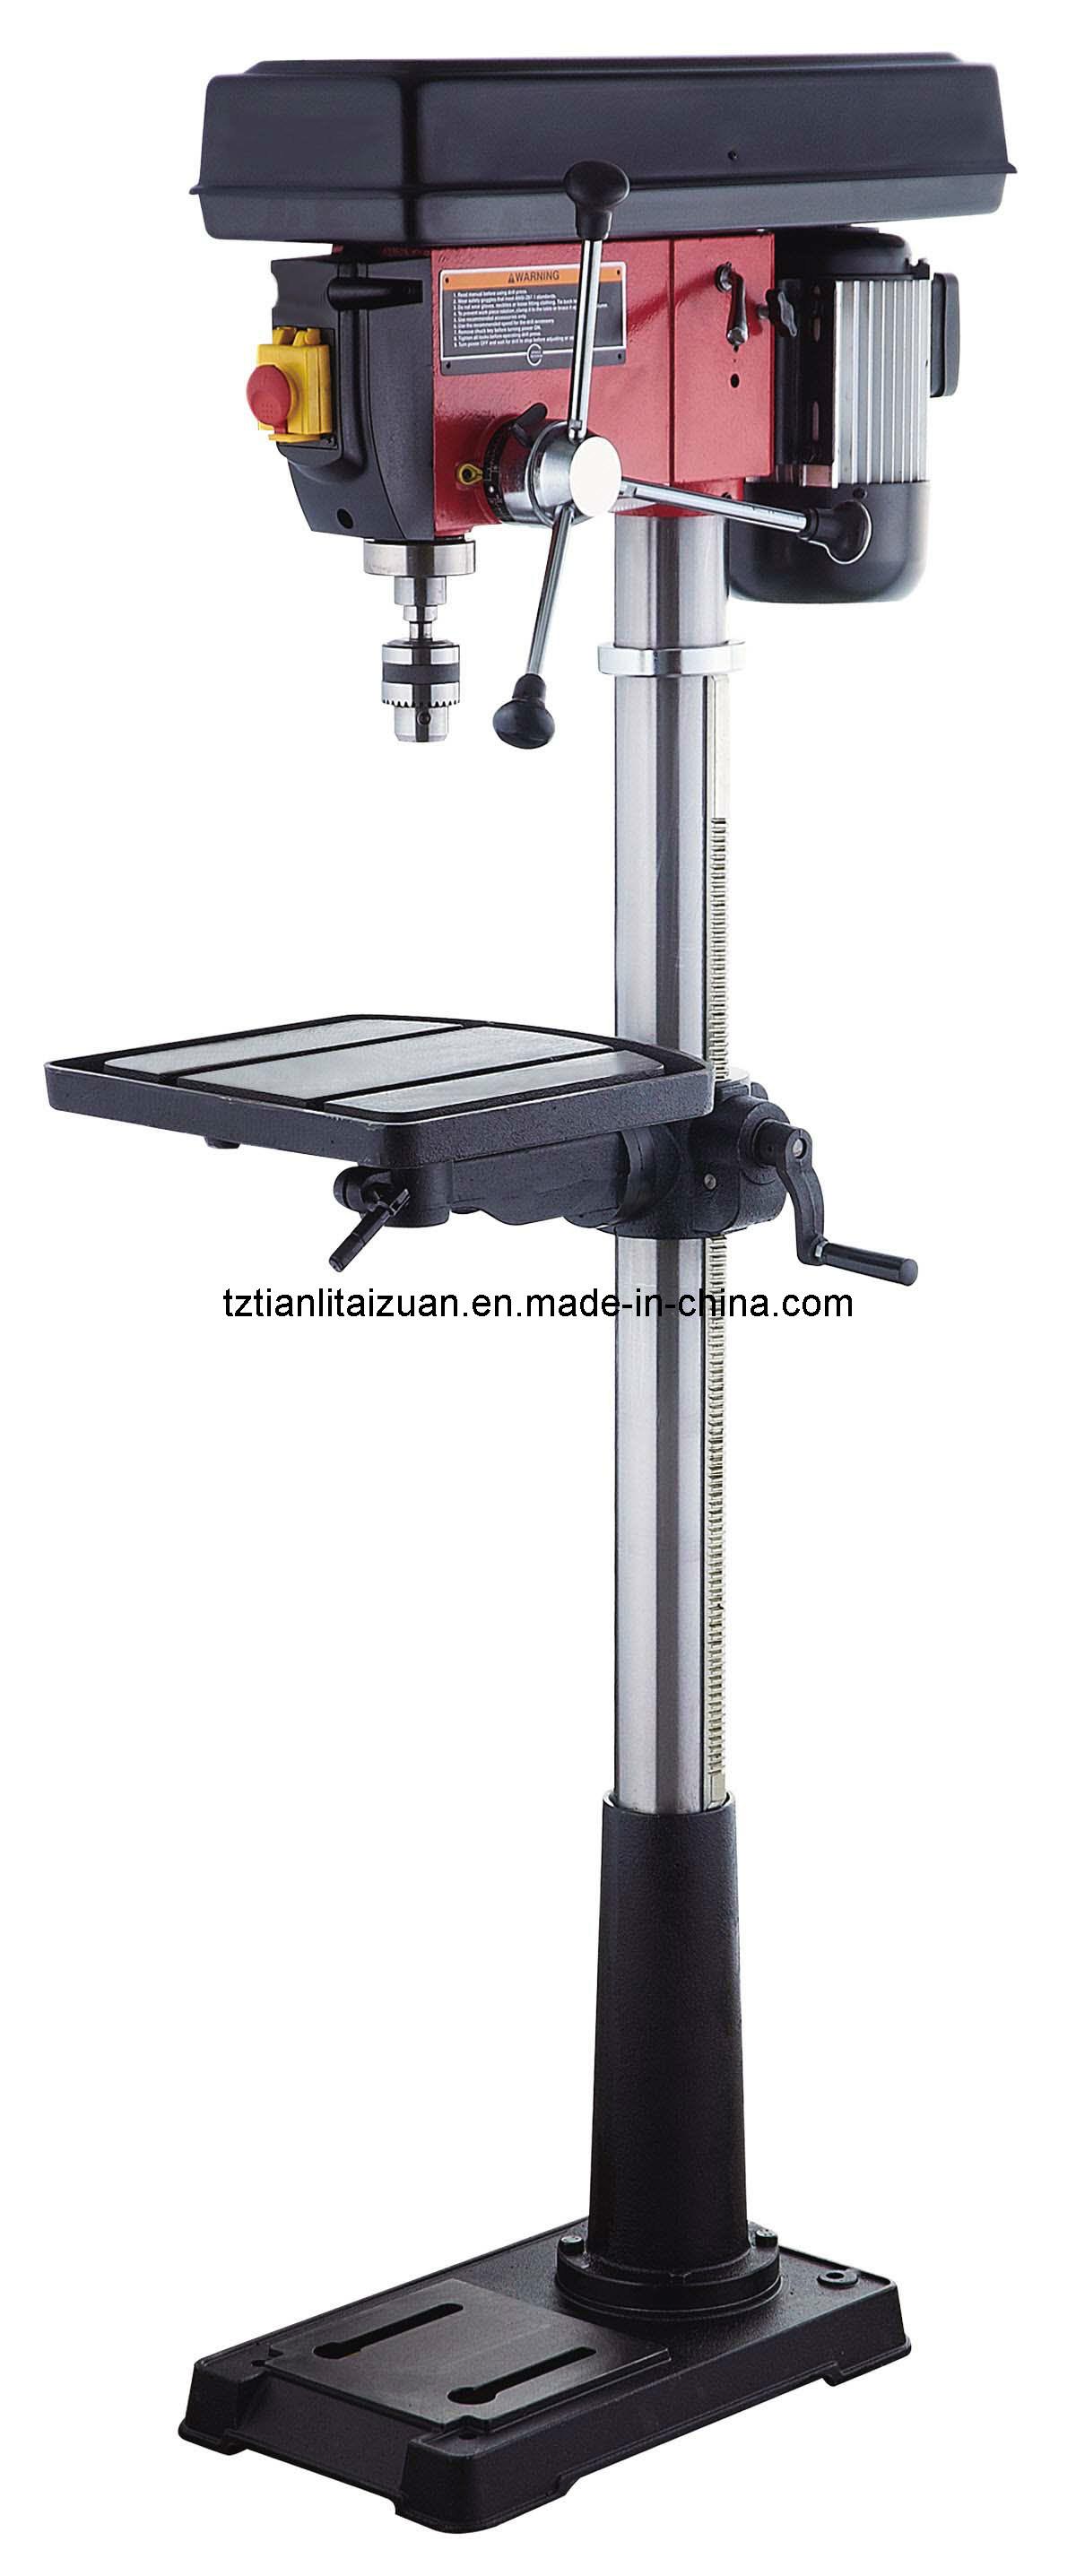 25mm drill 16 speeds 1100w floor type drill press for 16 speed floor drill press